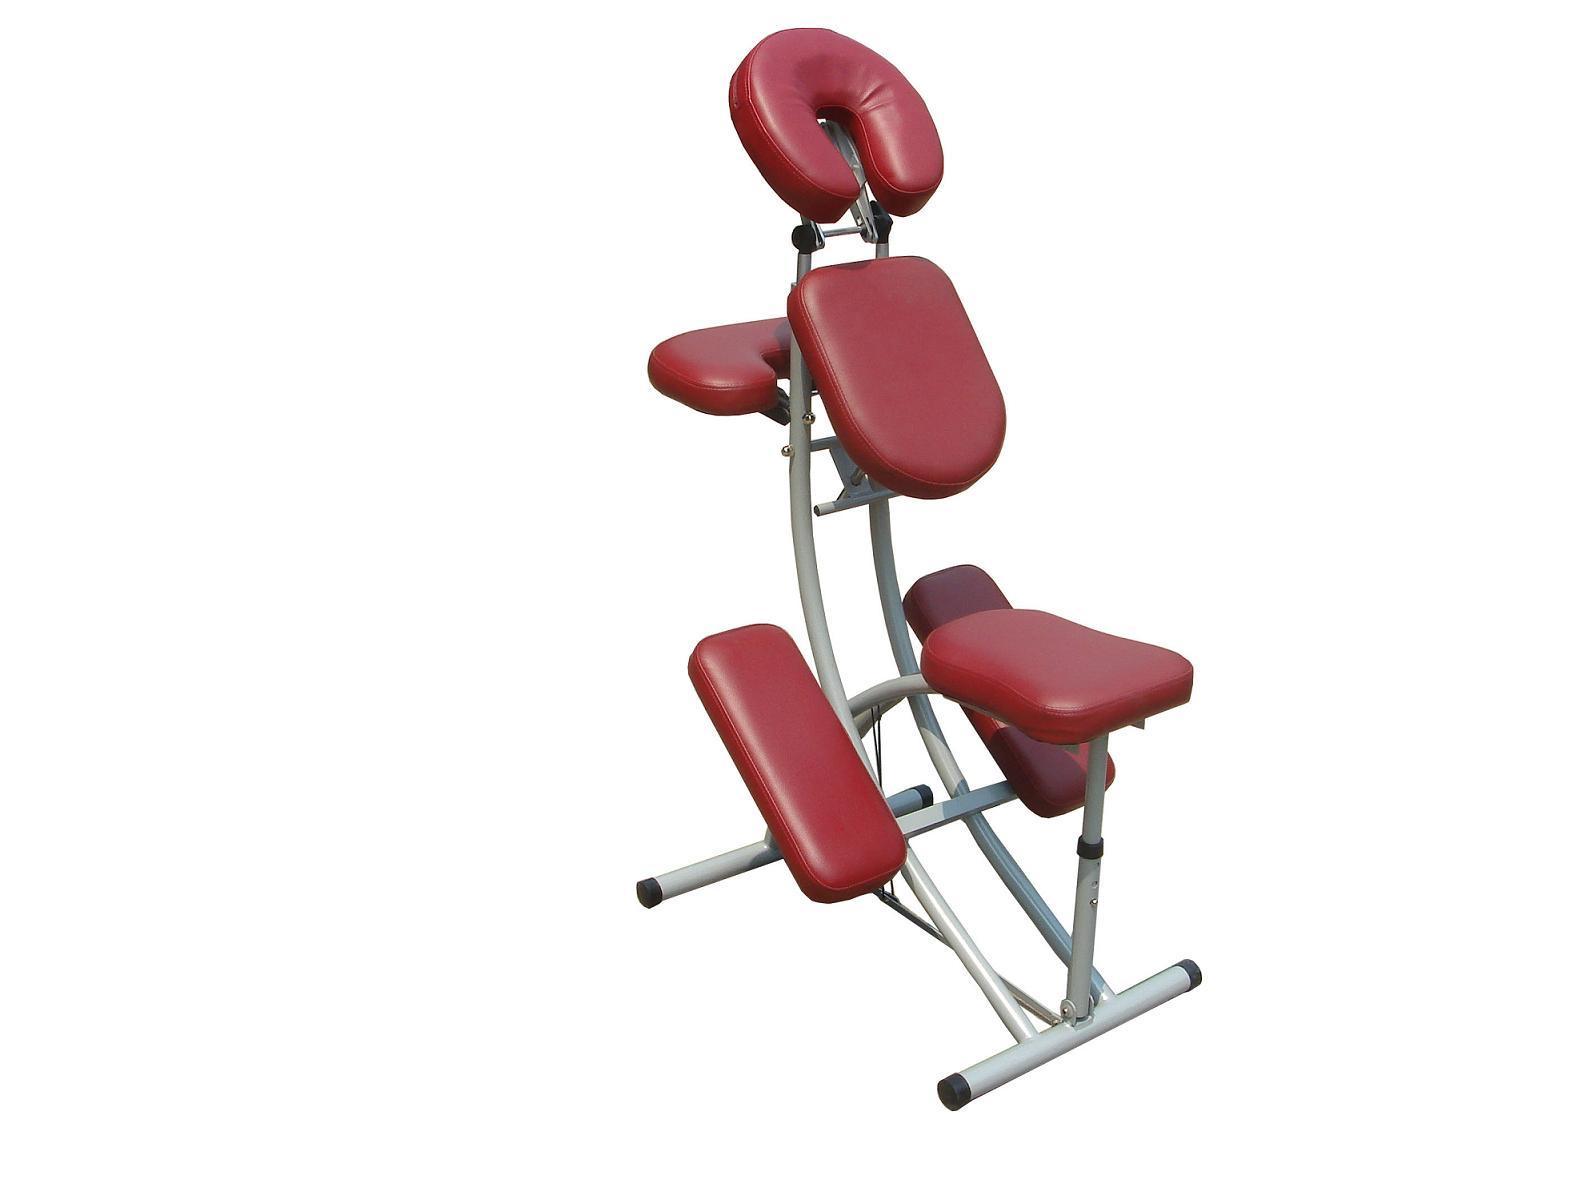 folding chair qatar swing hanger china massage km007 portable